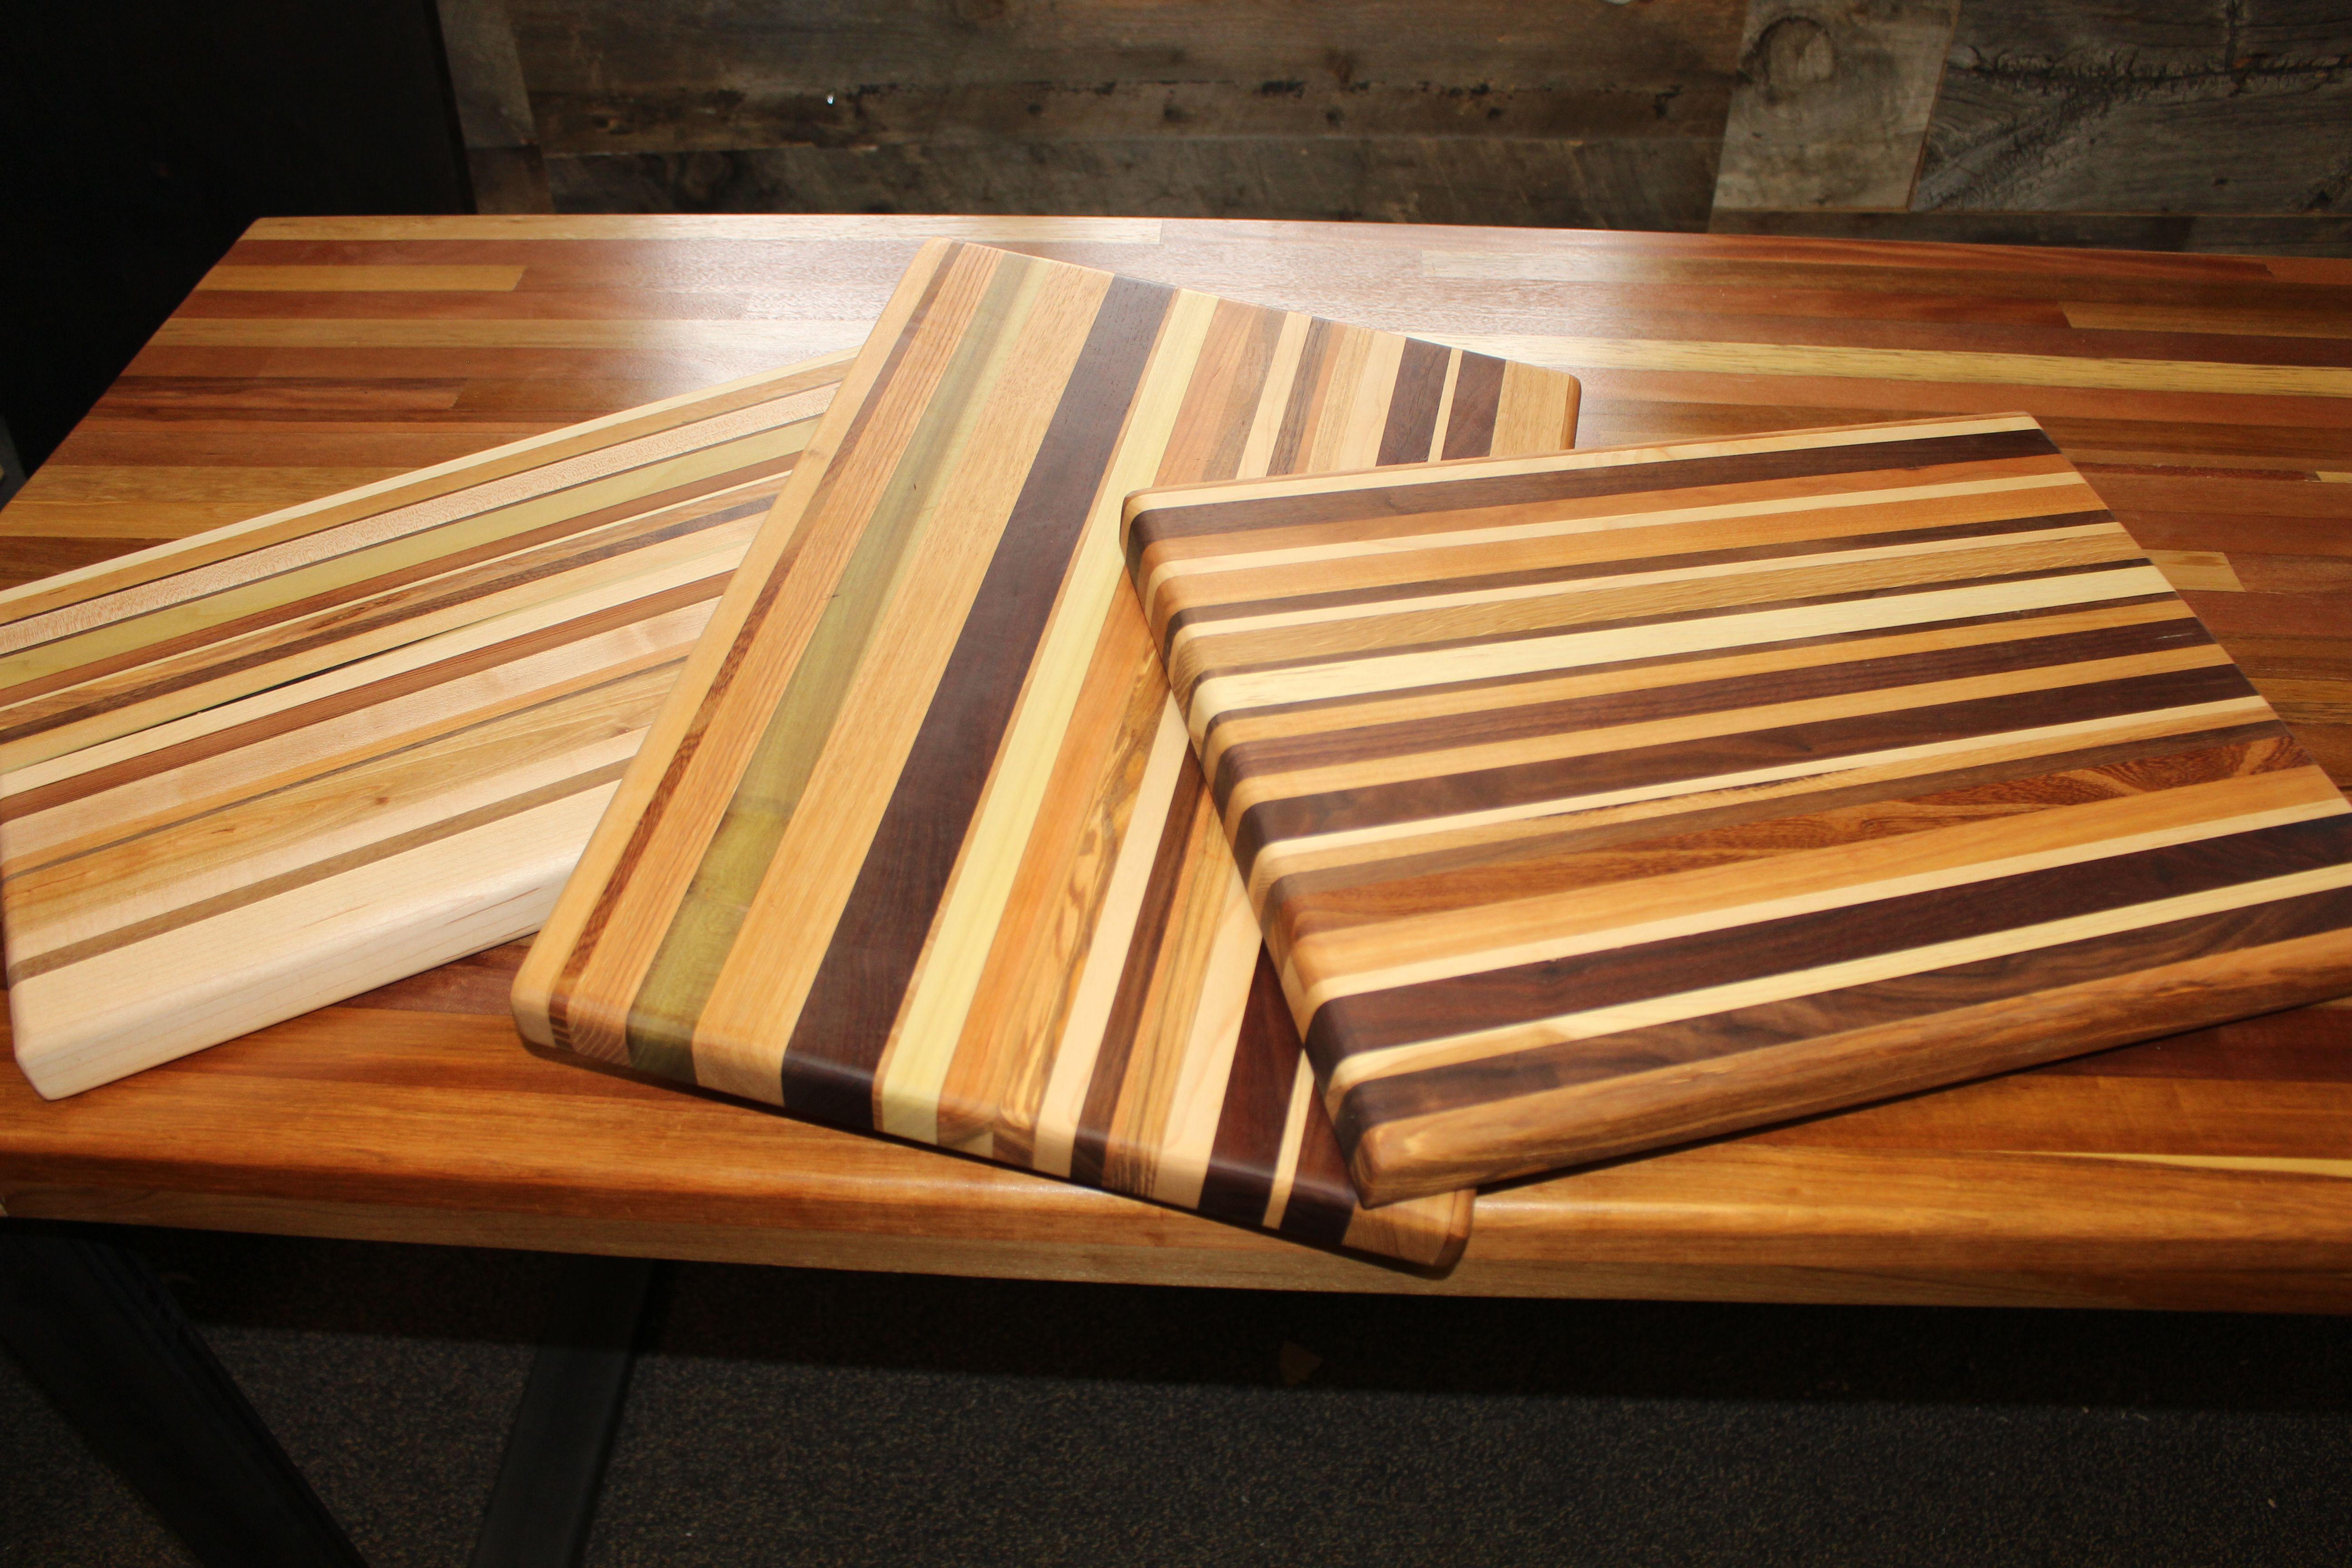 Handmade Custom Reclaimed Wood Cutting Board By Defiance Hardwood Custommade Com